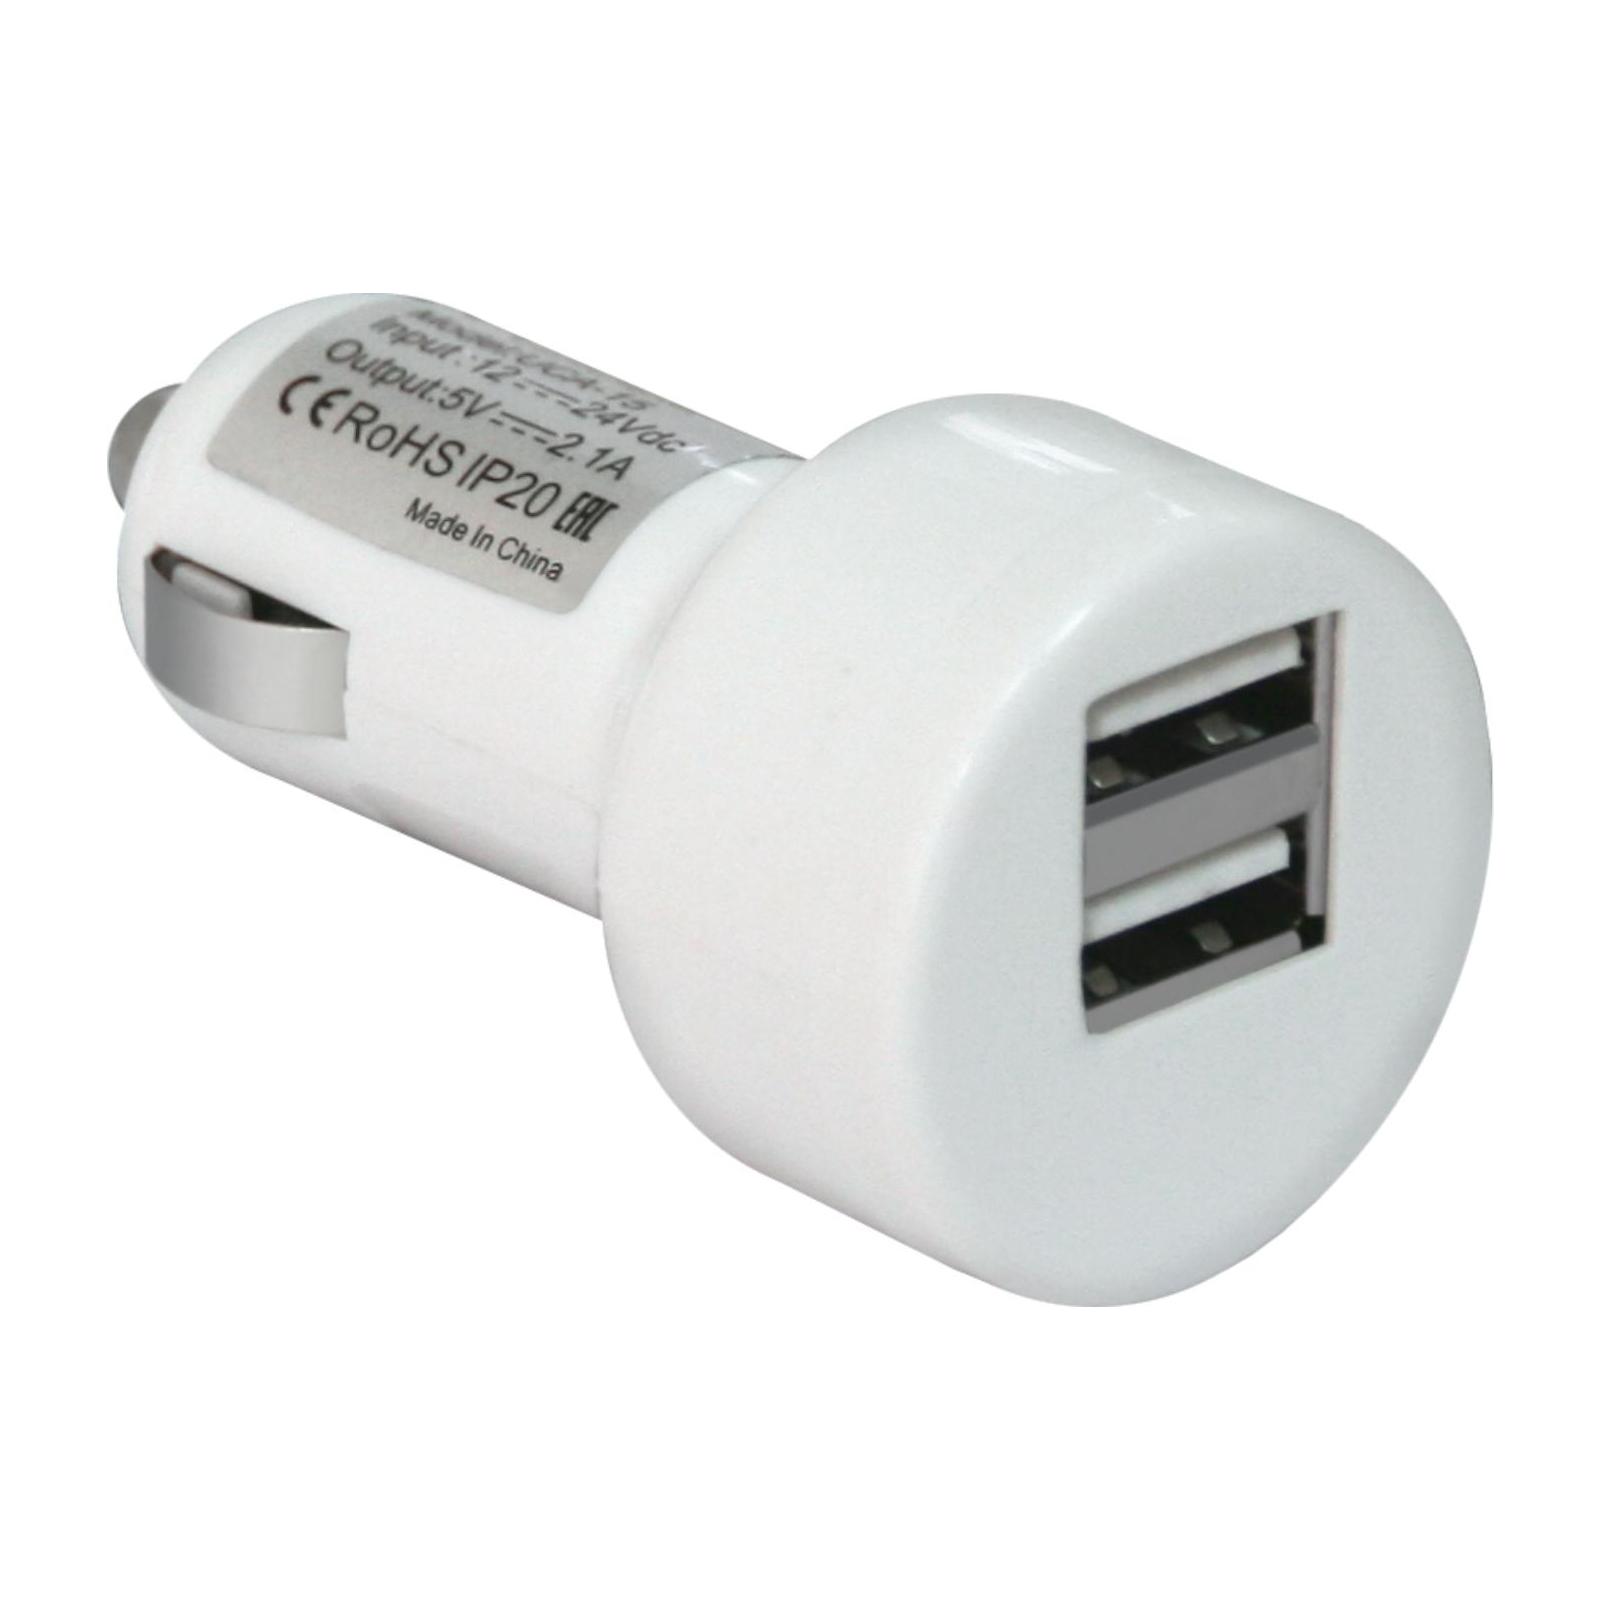 Зарядное устройство Defender UCA-15, 2*USB, 5V/2.1A, White (83562)